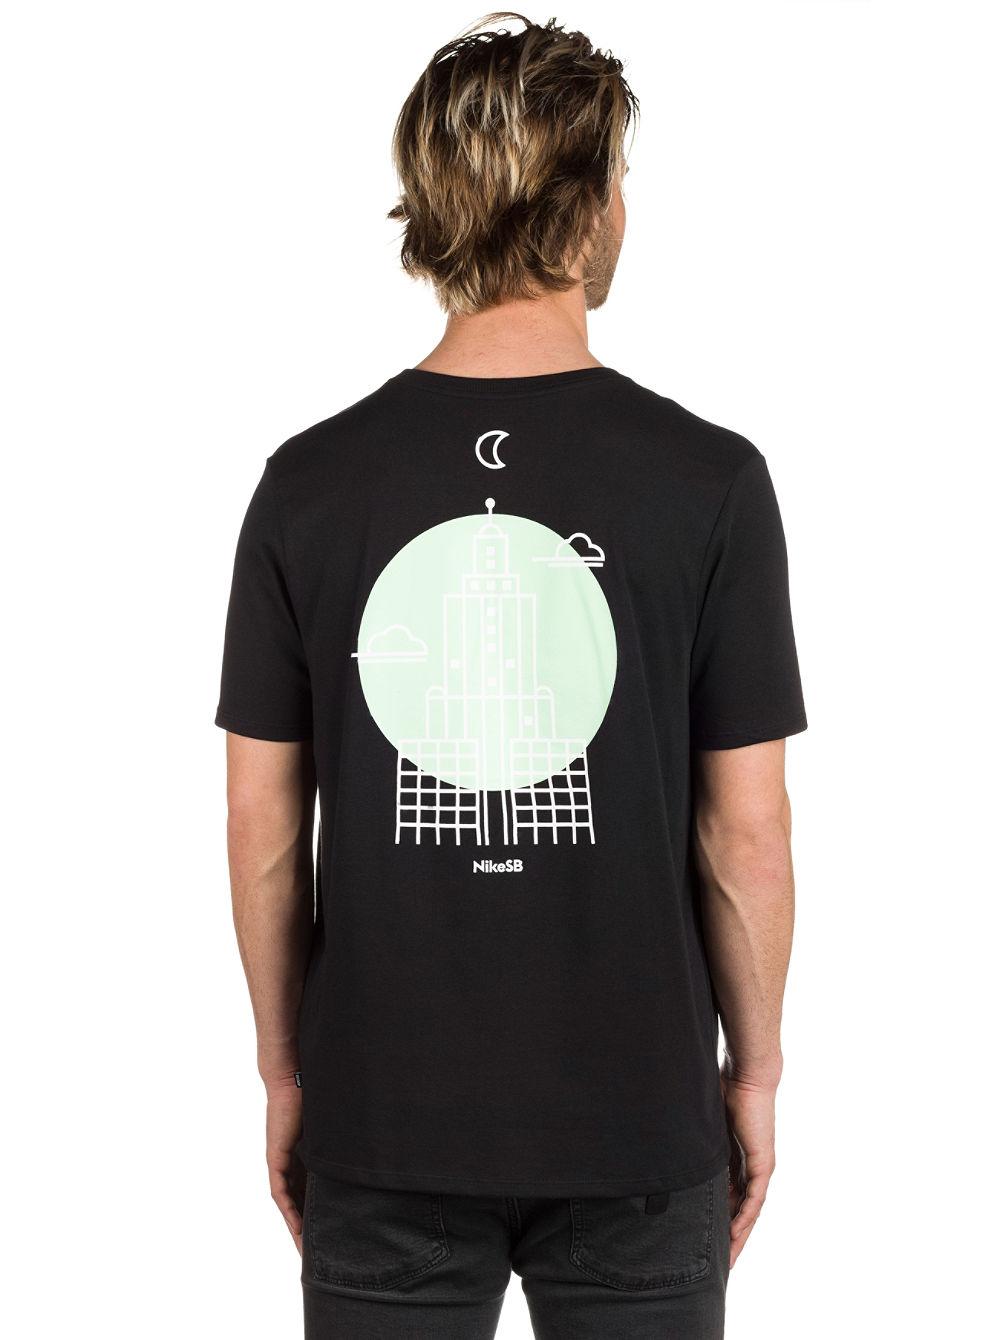 ae7dc7584f Buy Nike SB Dry Skyscrpr DF T-Shirt online at blue-tomato.com